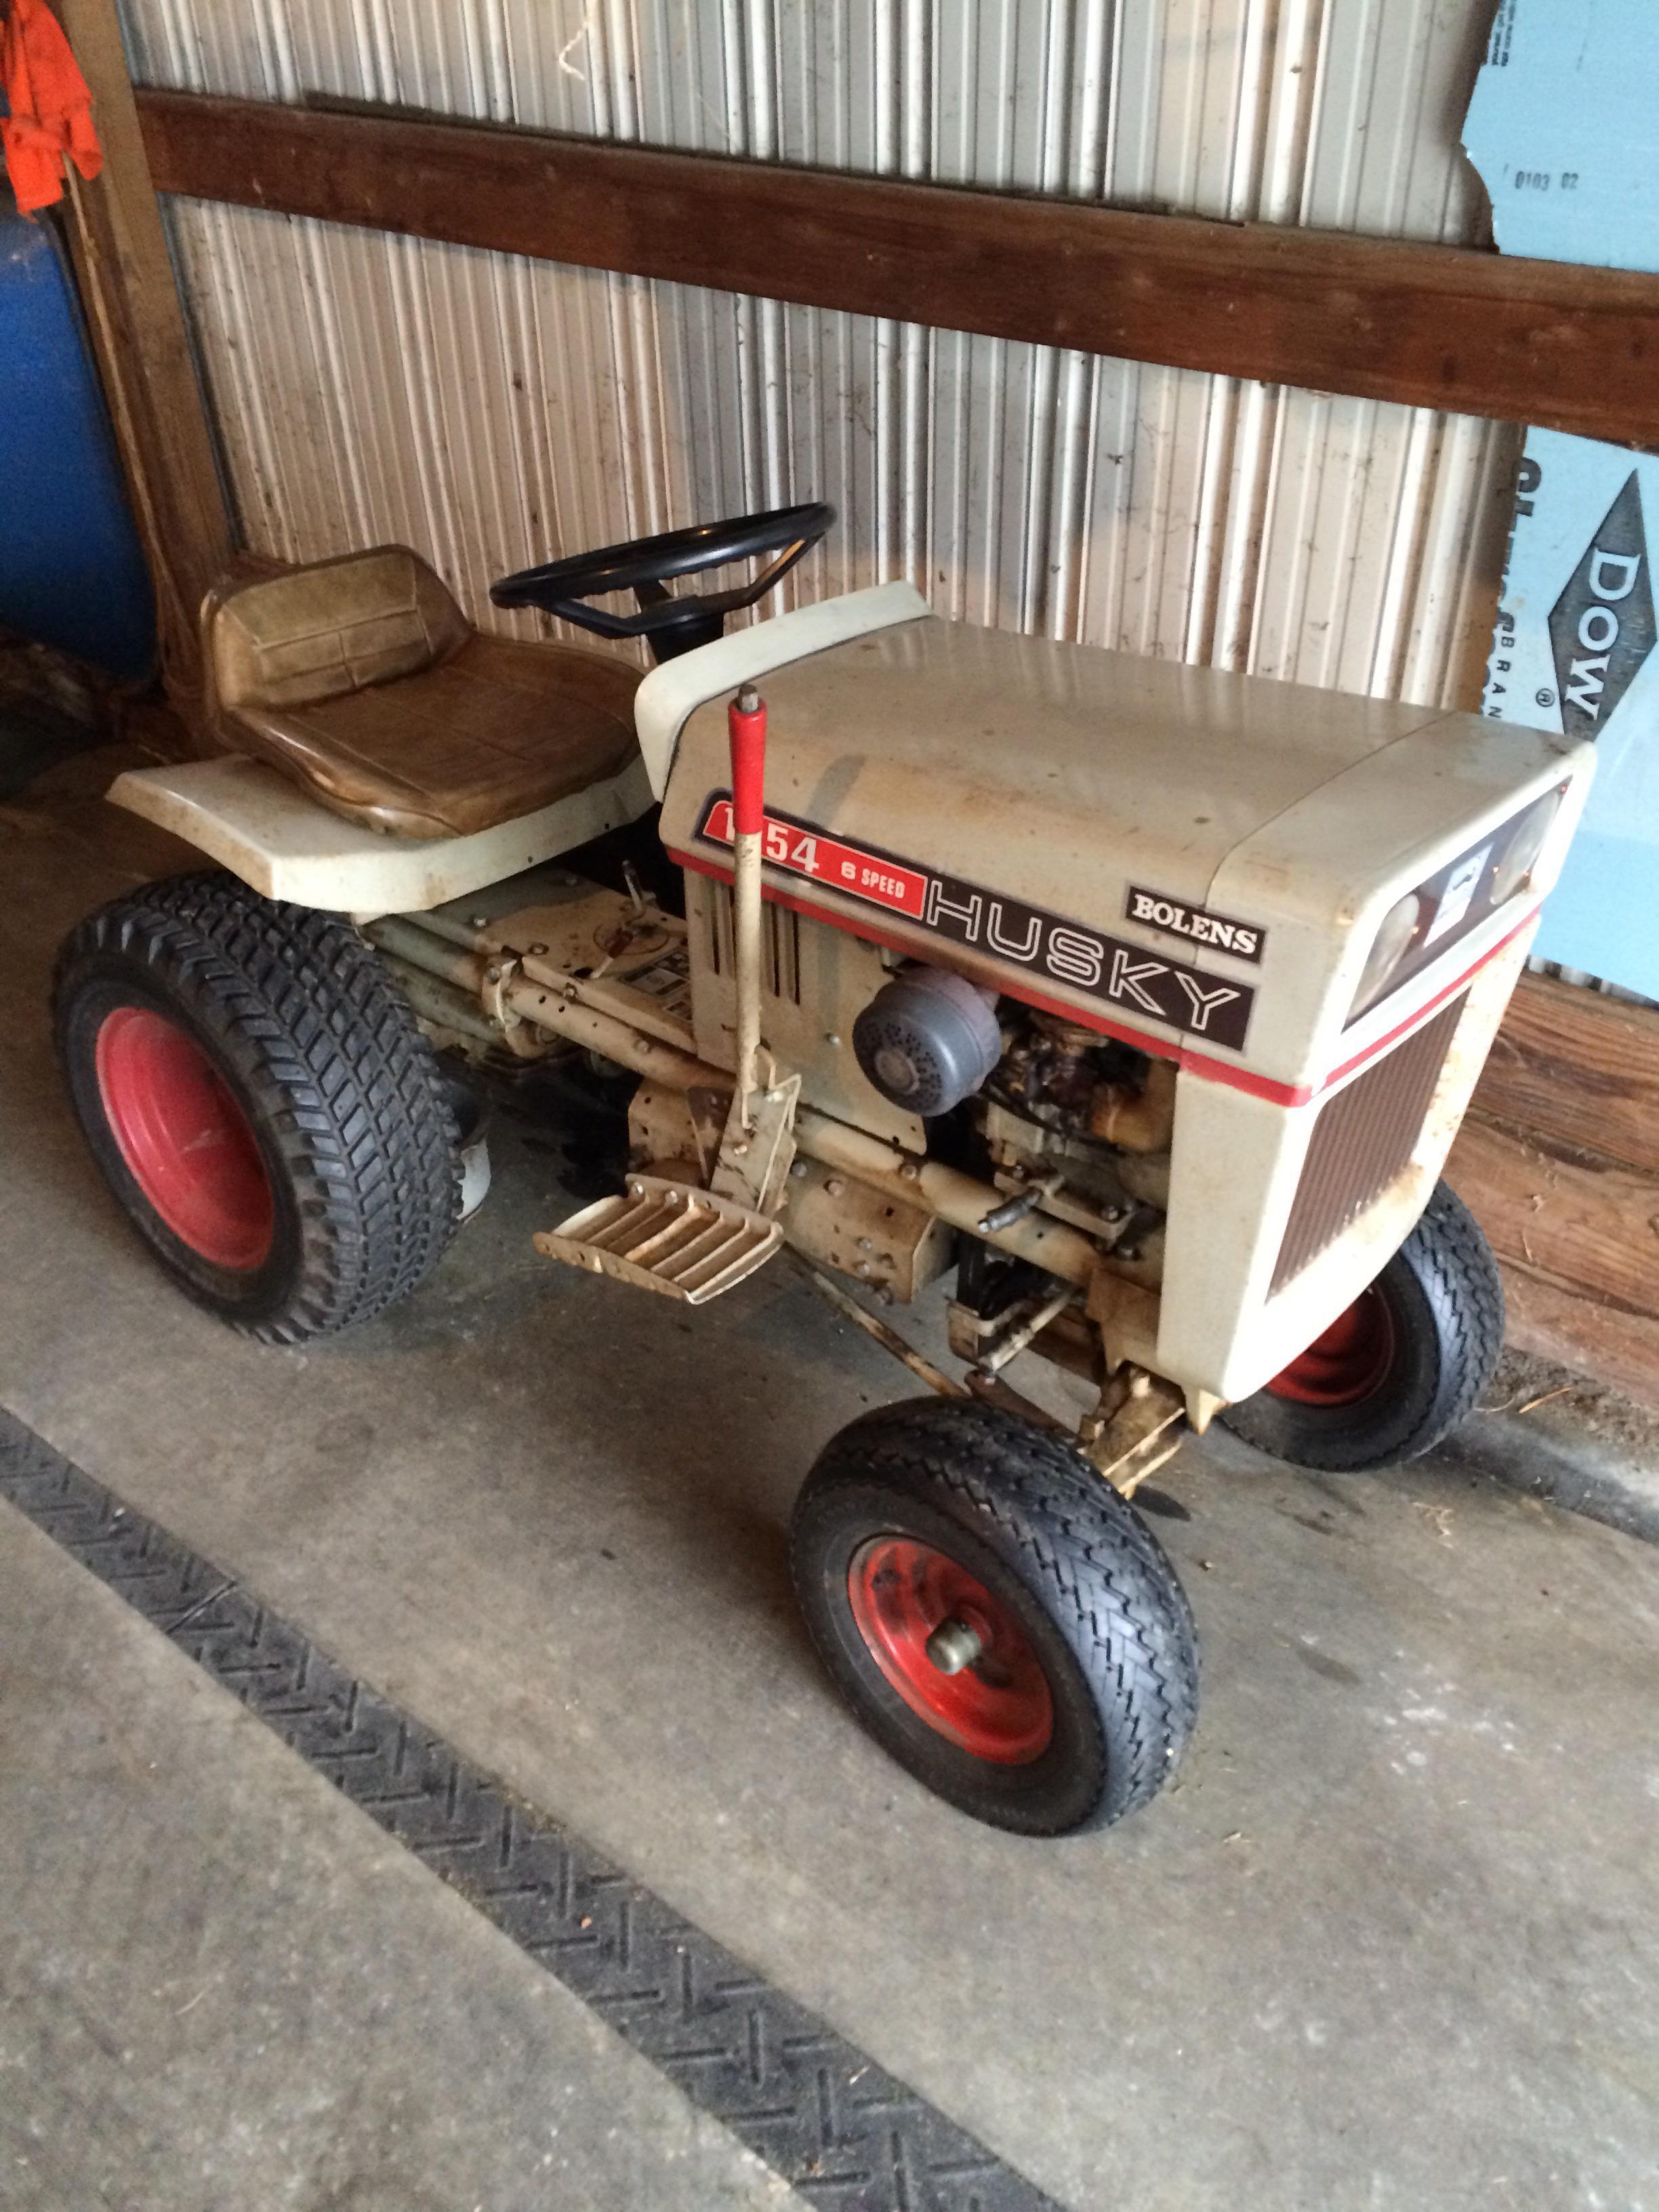 72 Bolens Husky 1054 - MyTractorForum com - The Friendliest Tractor